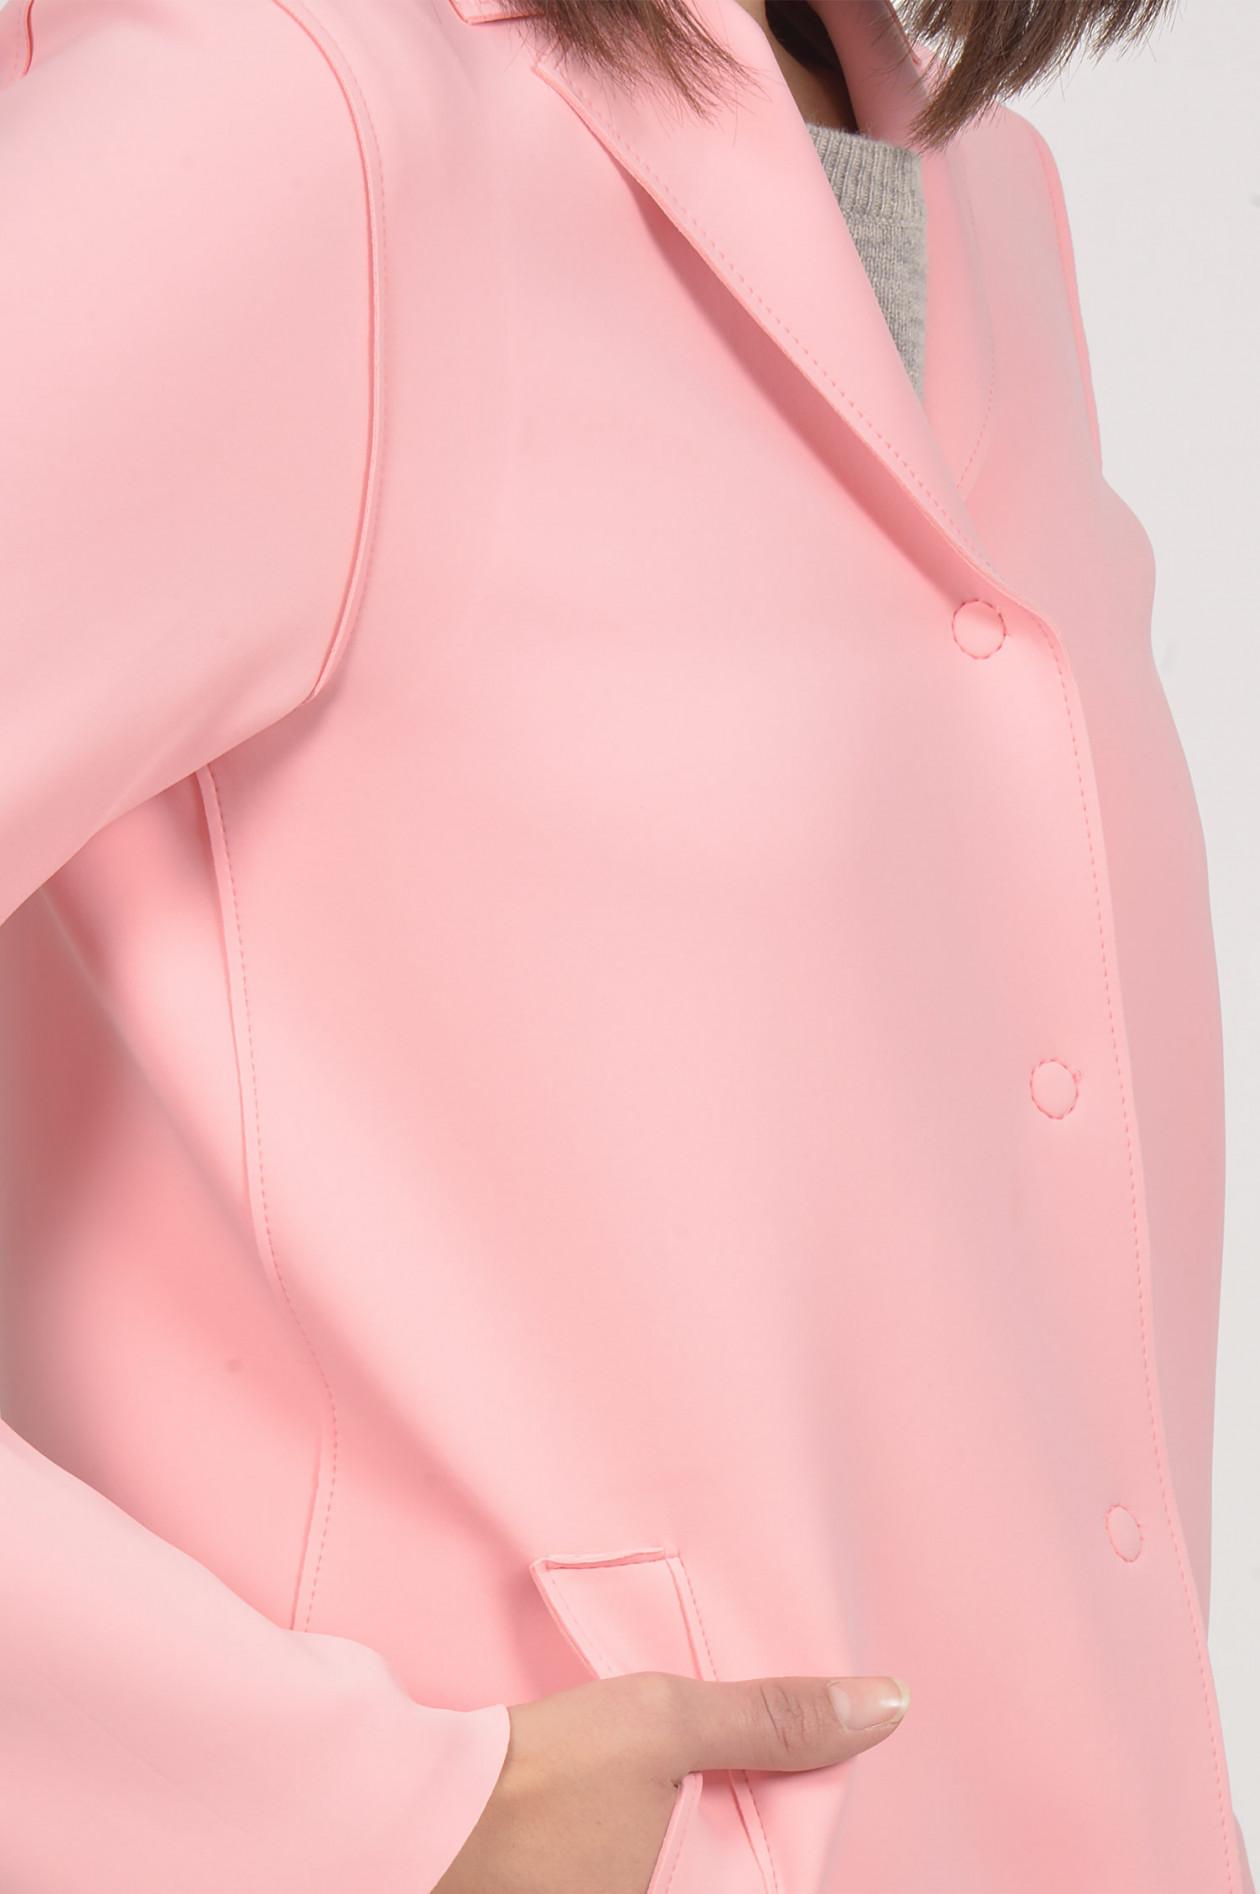 Neoprenmantel in Pink